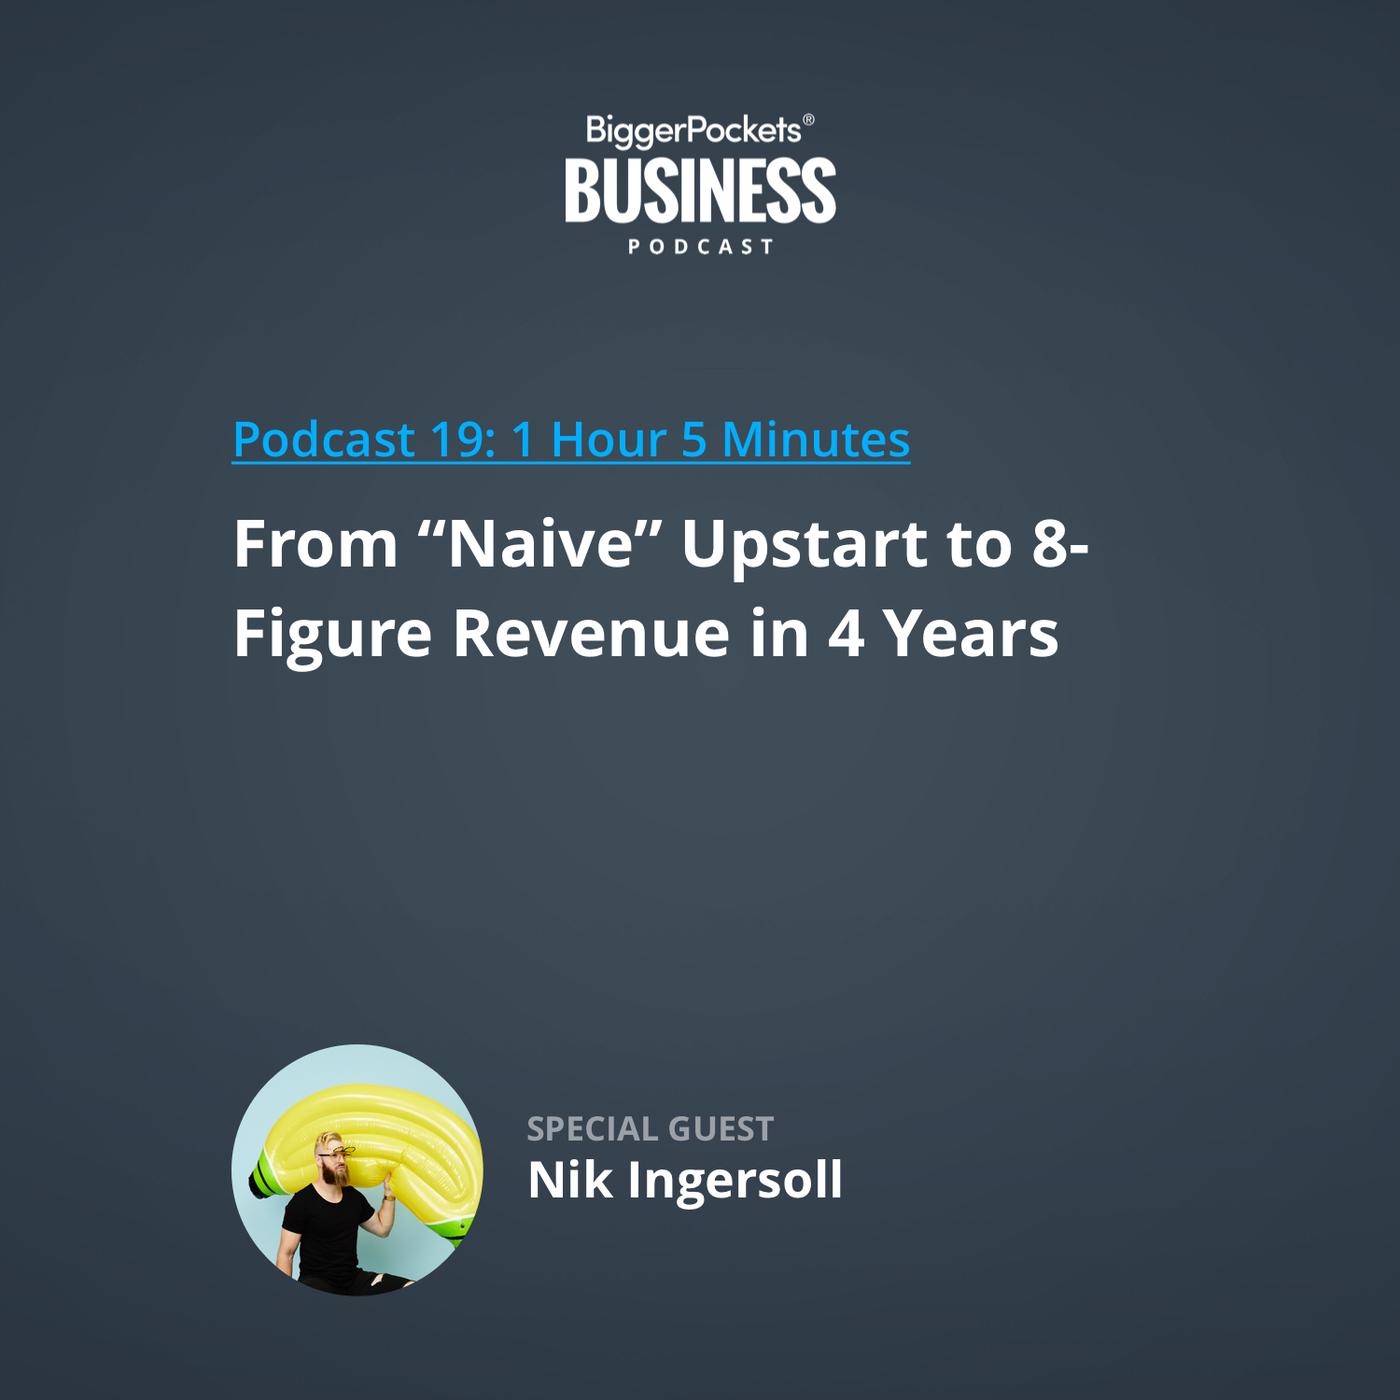 BiggerPockets Business Podcast   Podbay